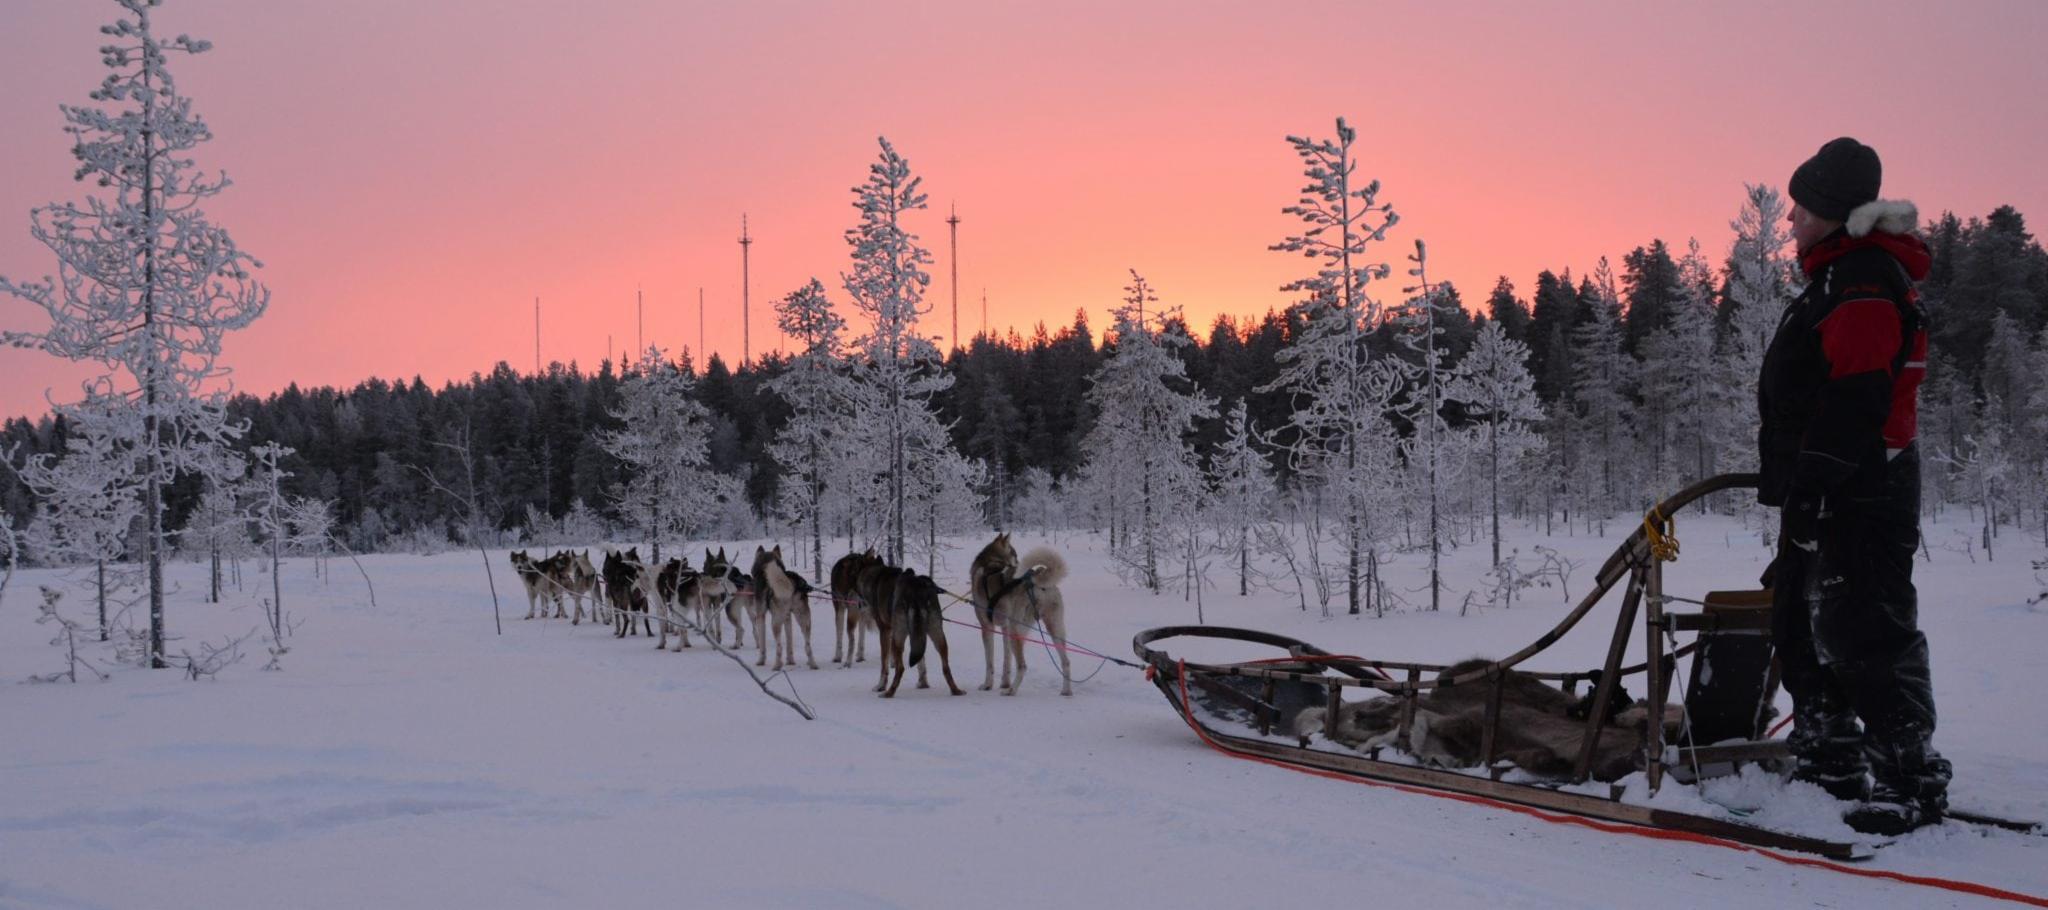 Husky Park in Lapland